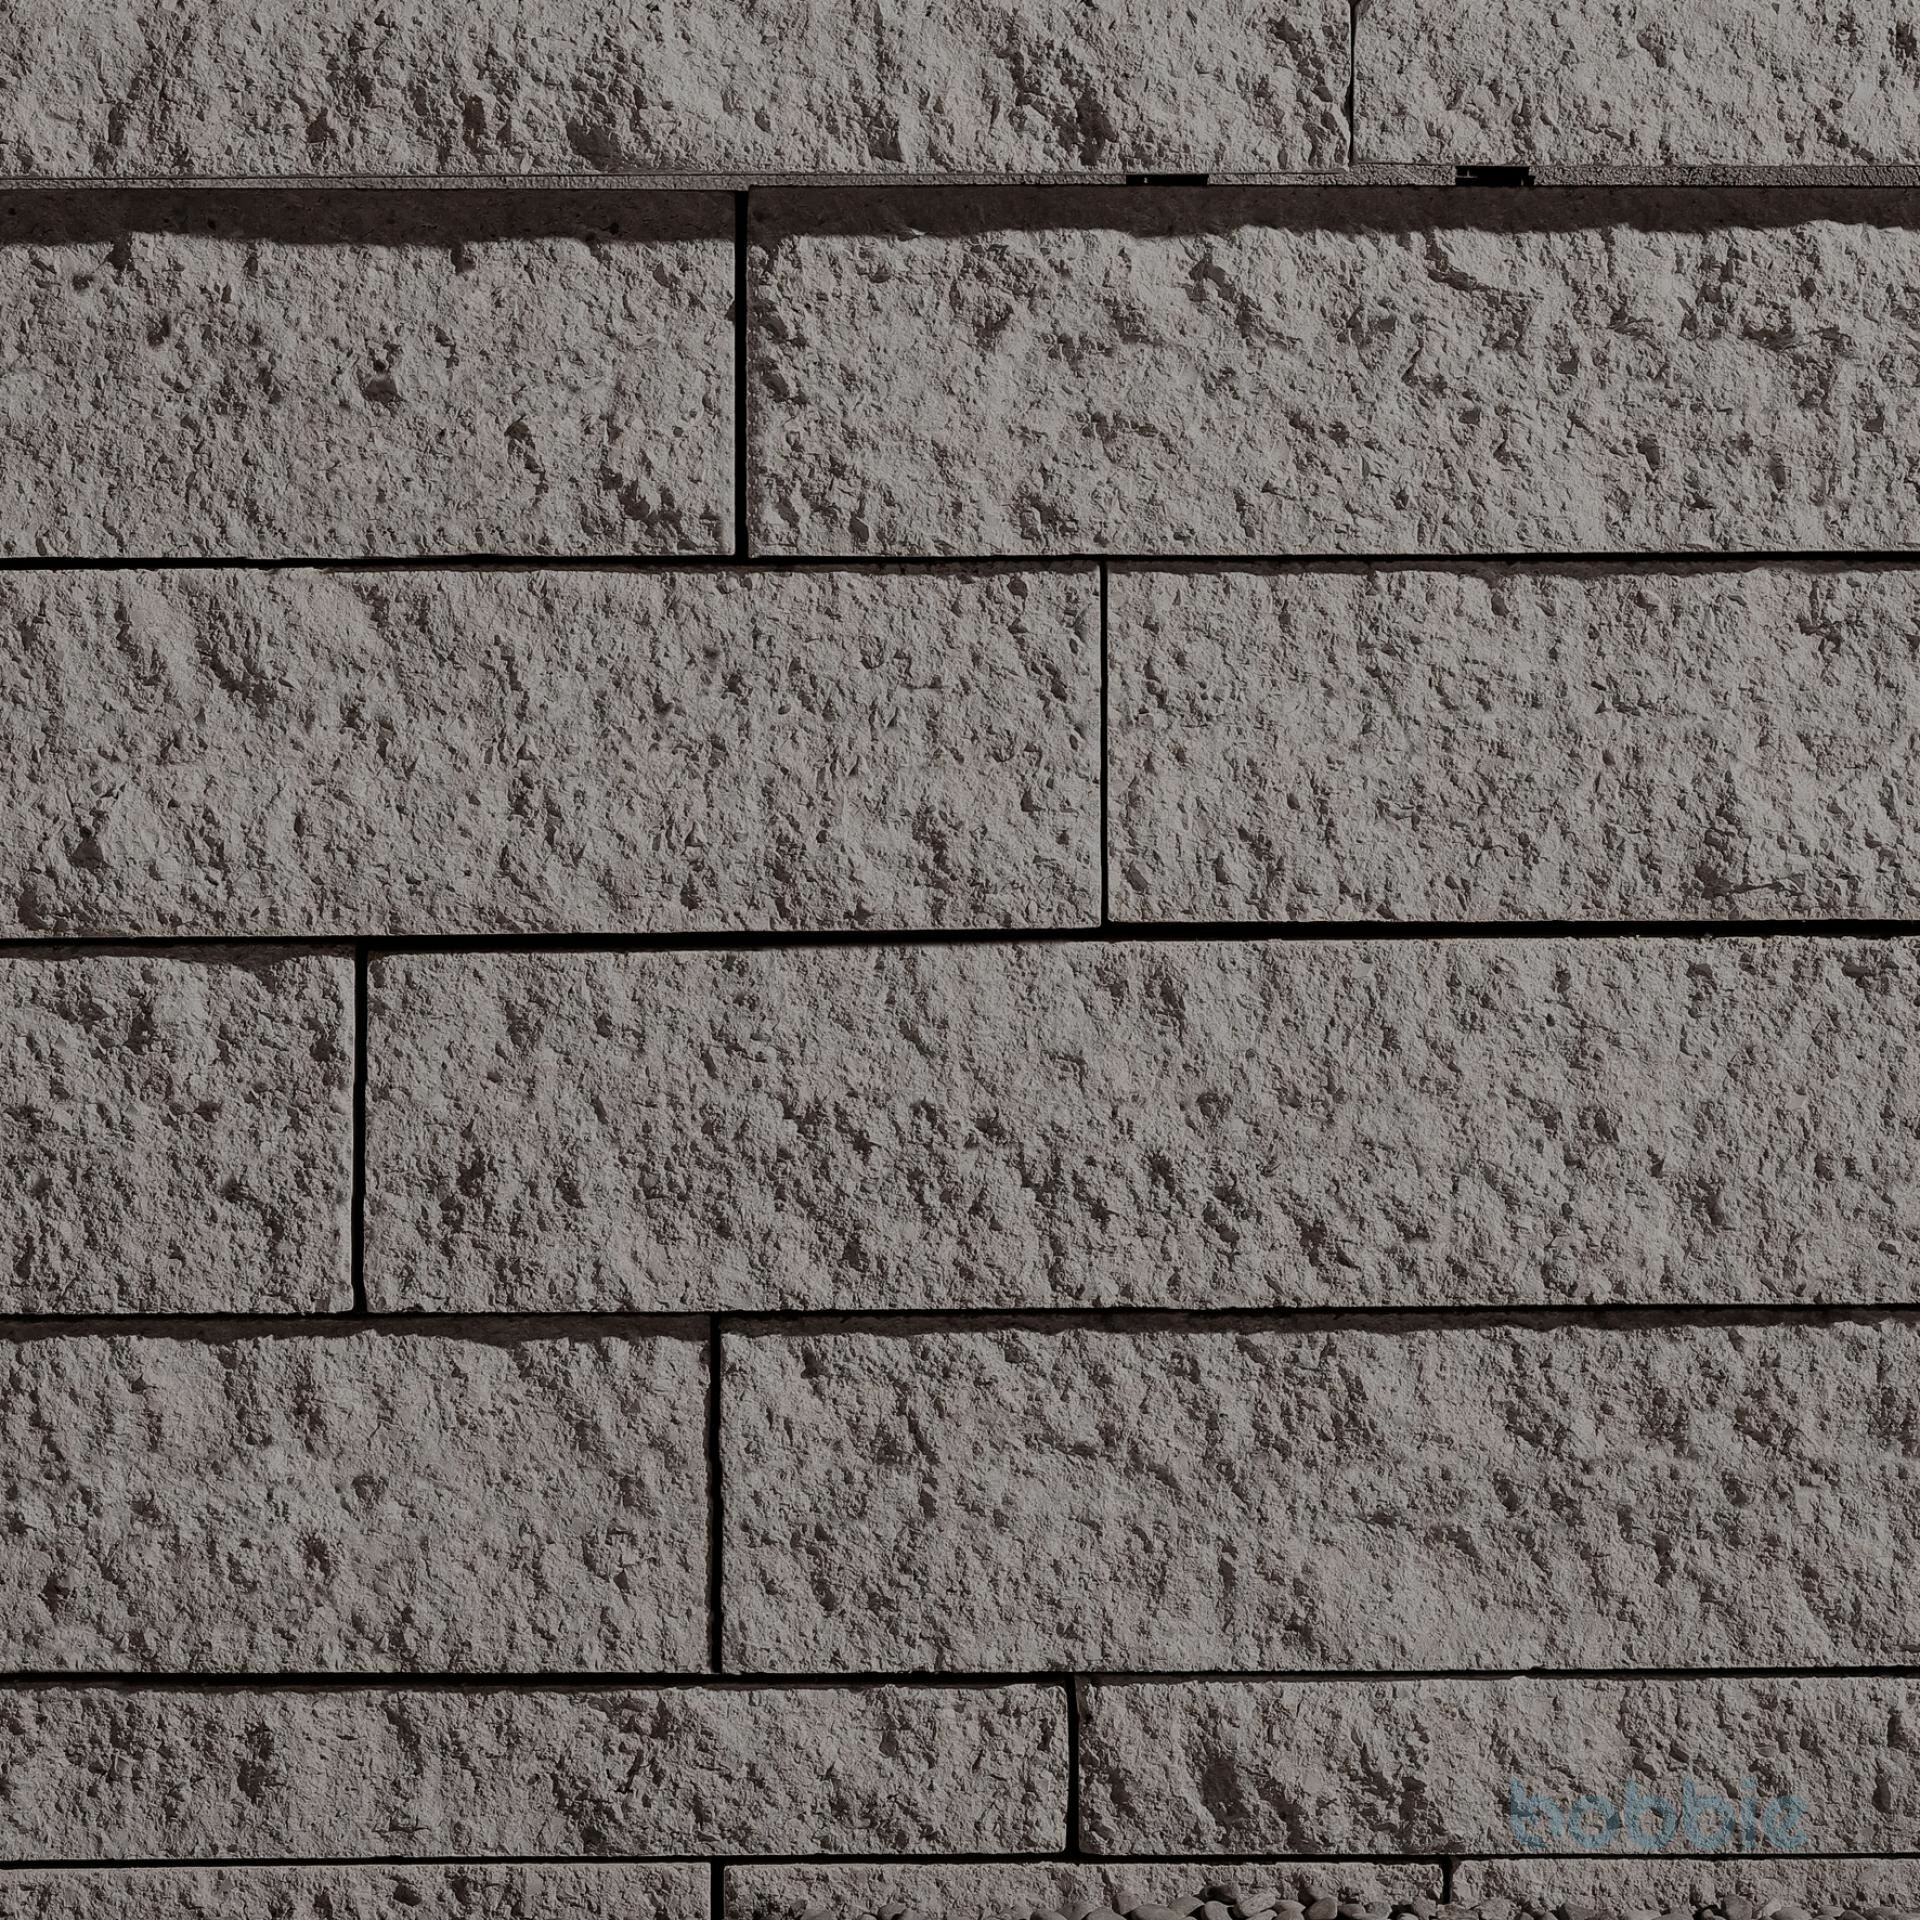 Mauern, CULT® GRANDE, 1200x225x150, Basalt